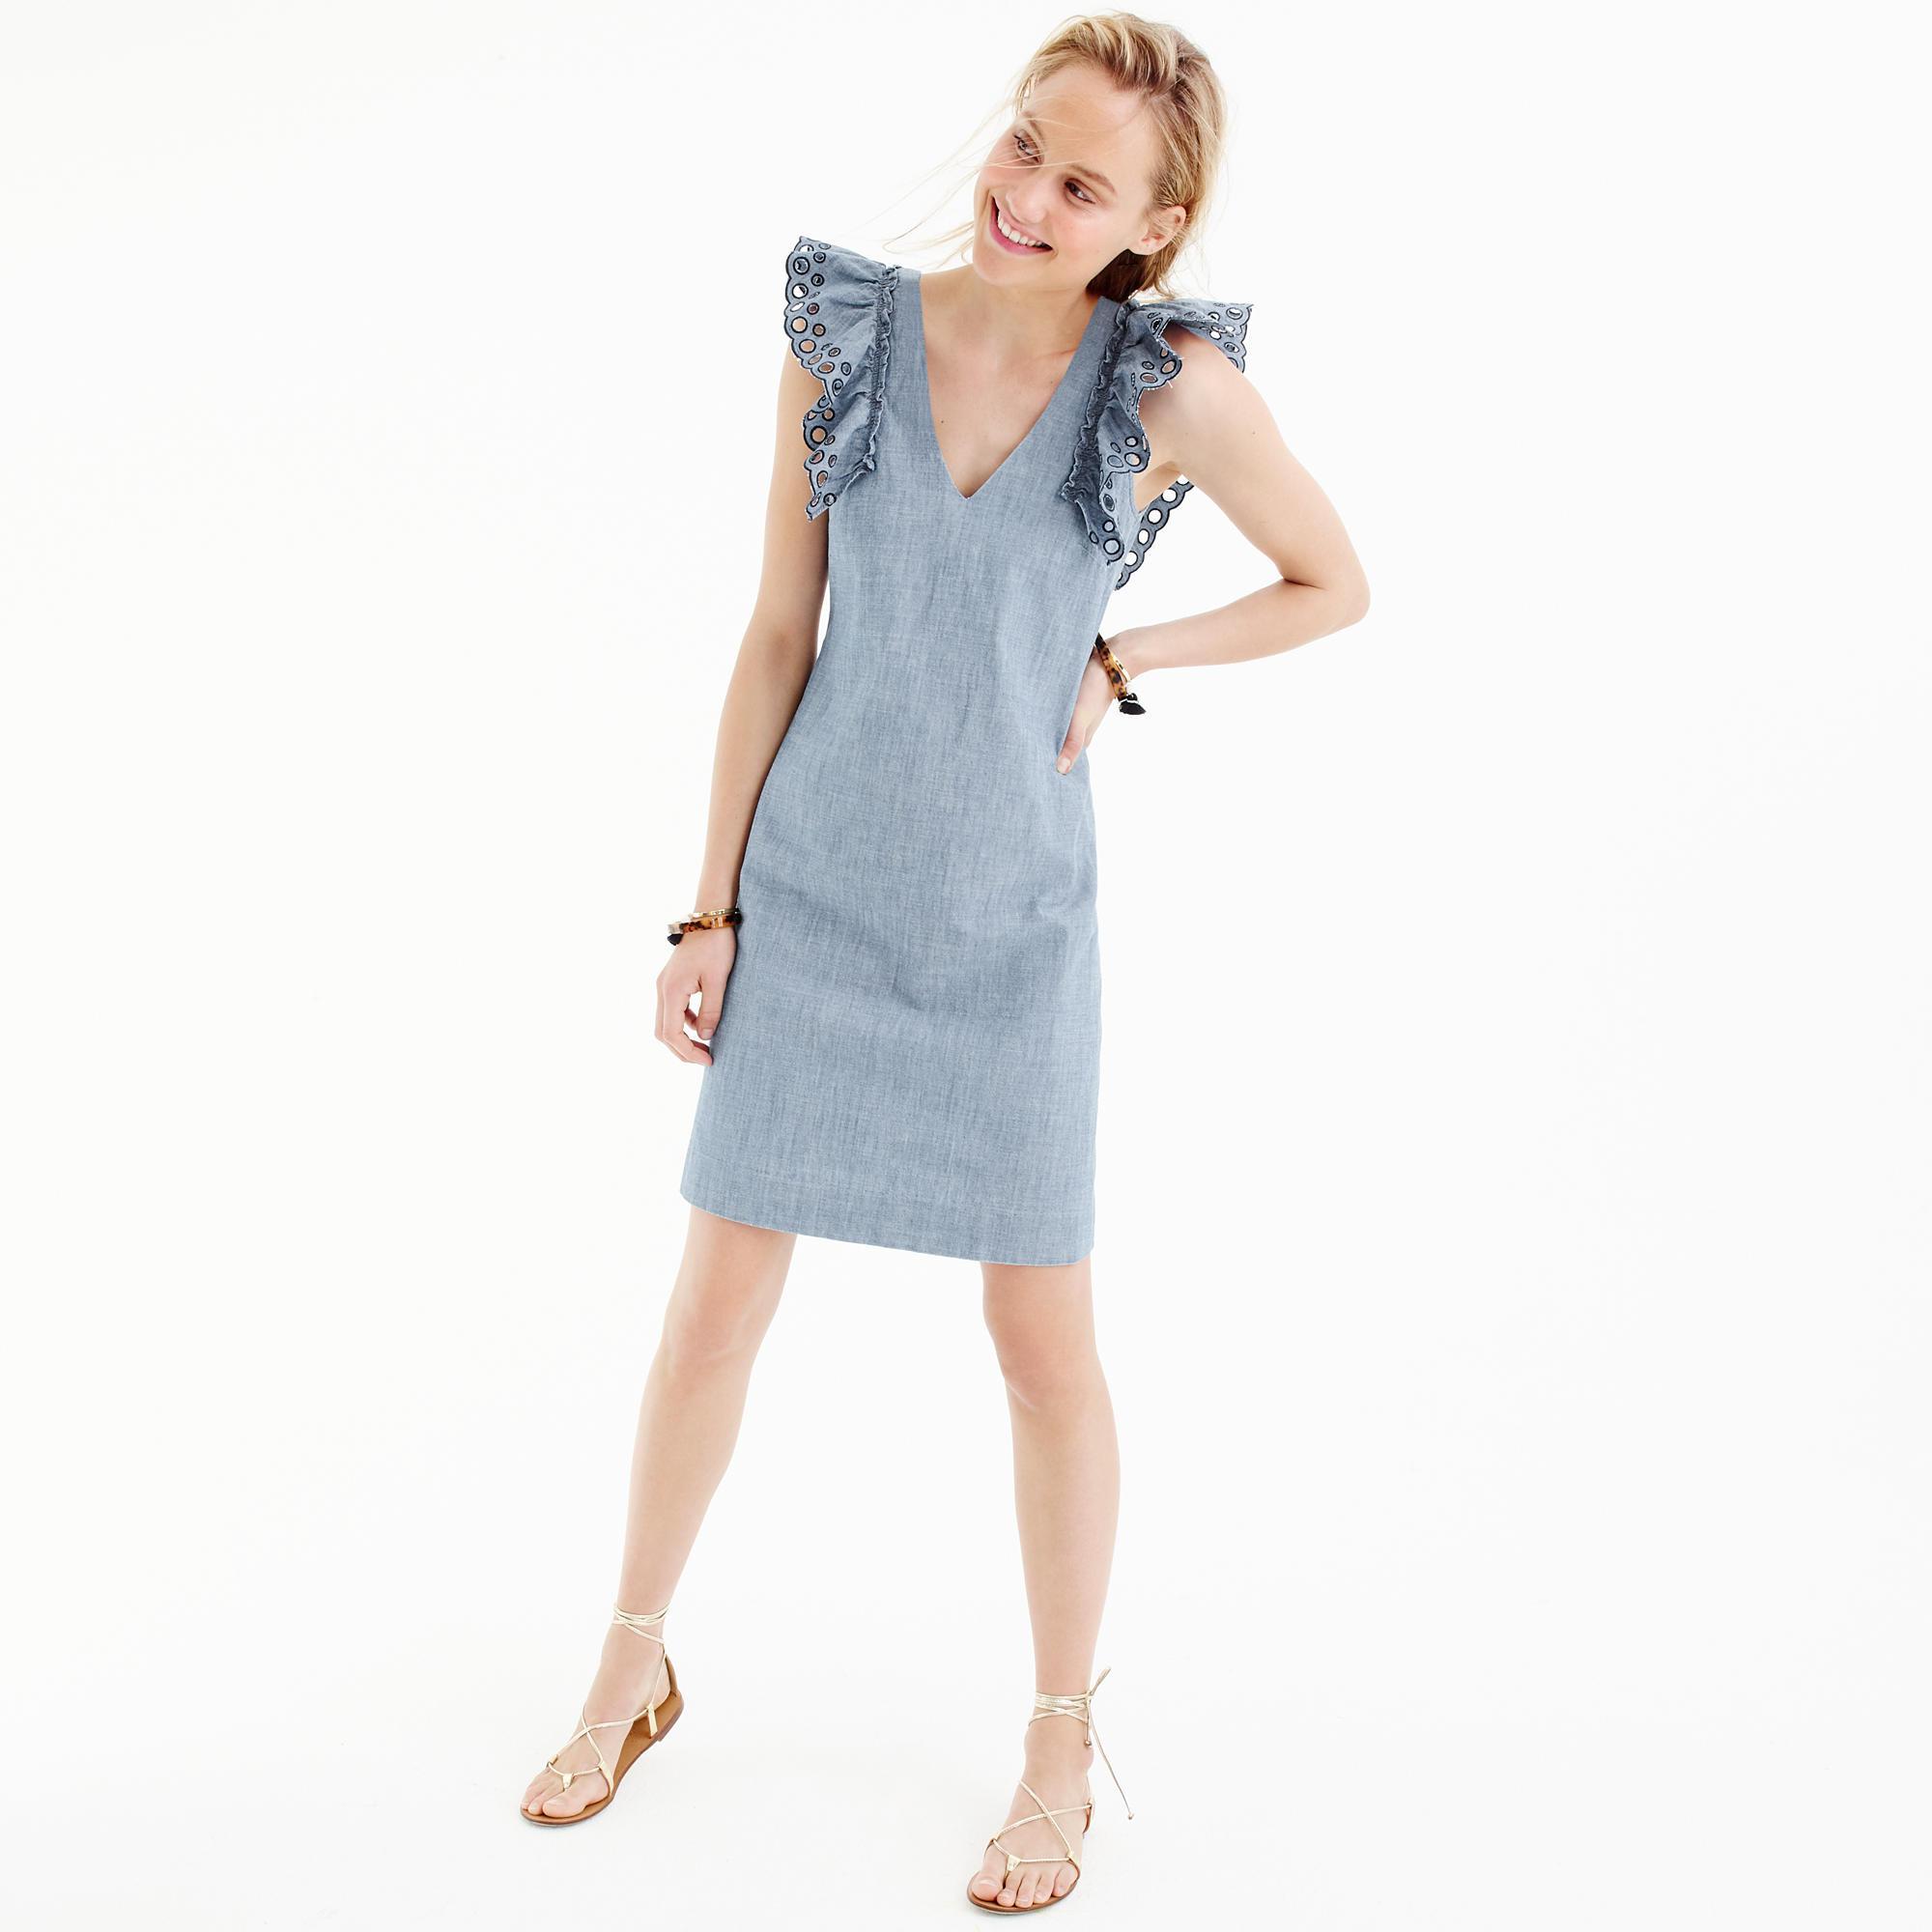 3d2fce4cc4d2 J.Crew Chambray Ruffle-shoulder Sheath Dress in Blue - Lyst